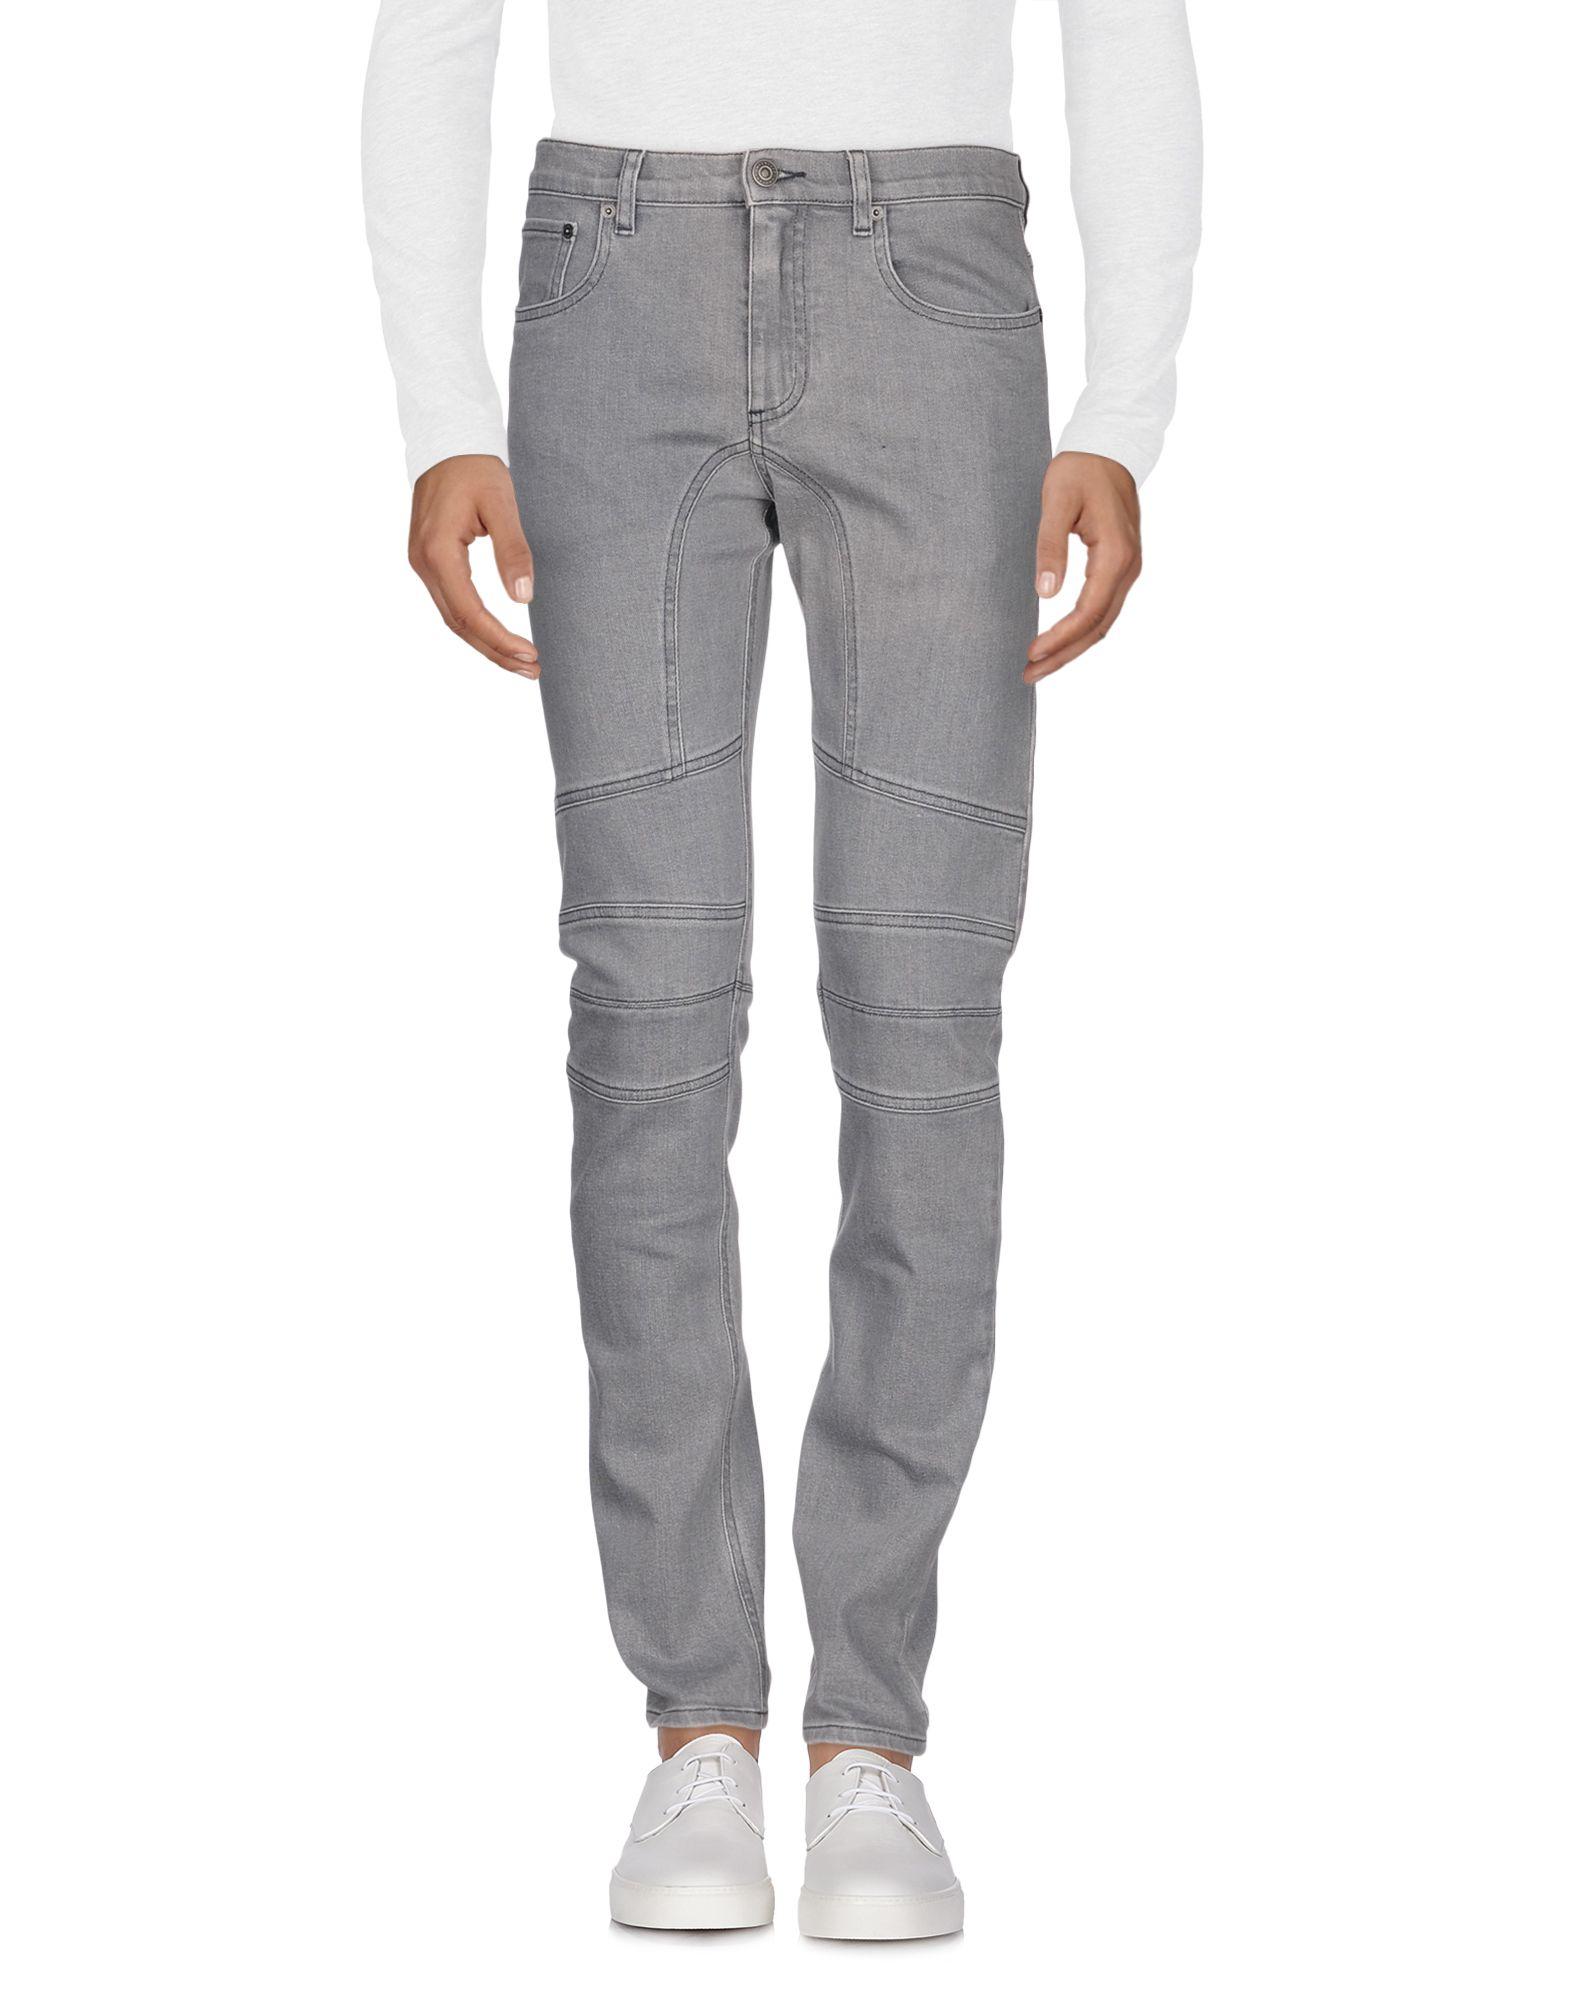 Pantaloni Belstaff Jeans Belstaff Pantaloni Uomo - 42681414RG 66bcc8